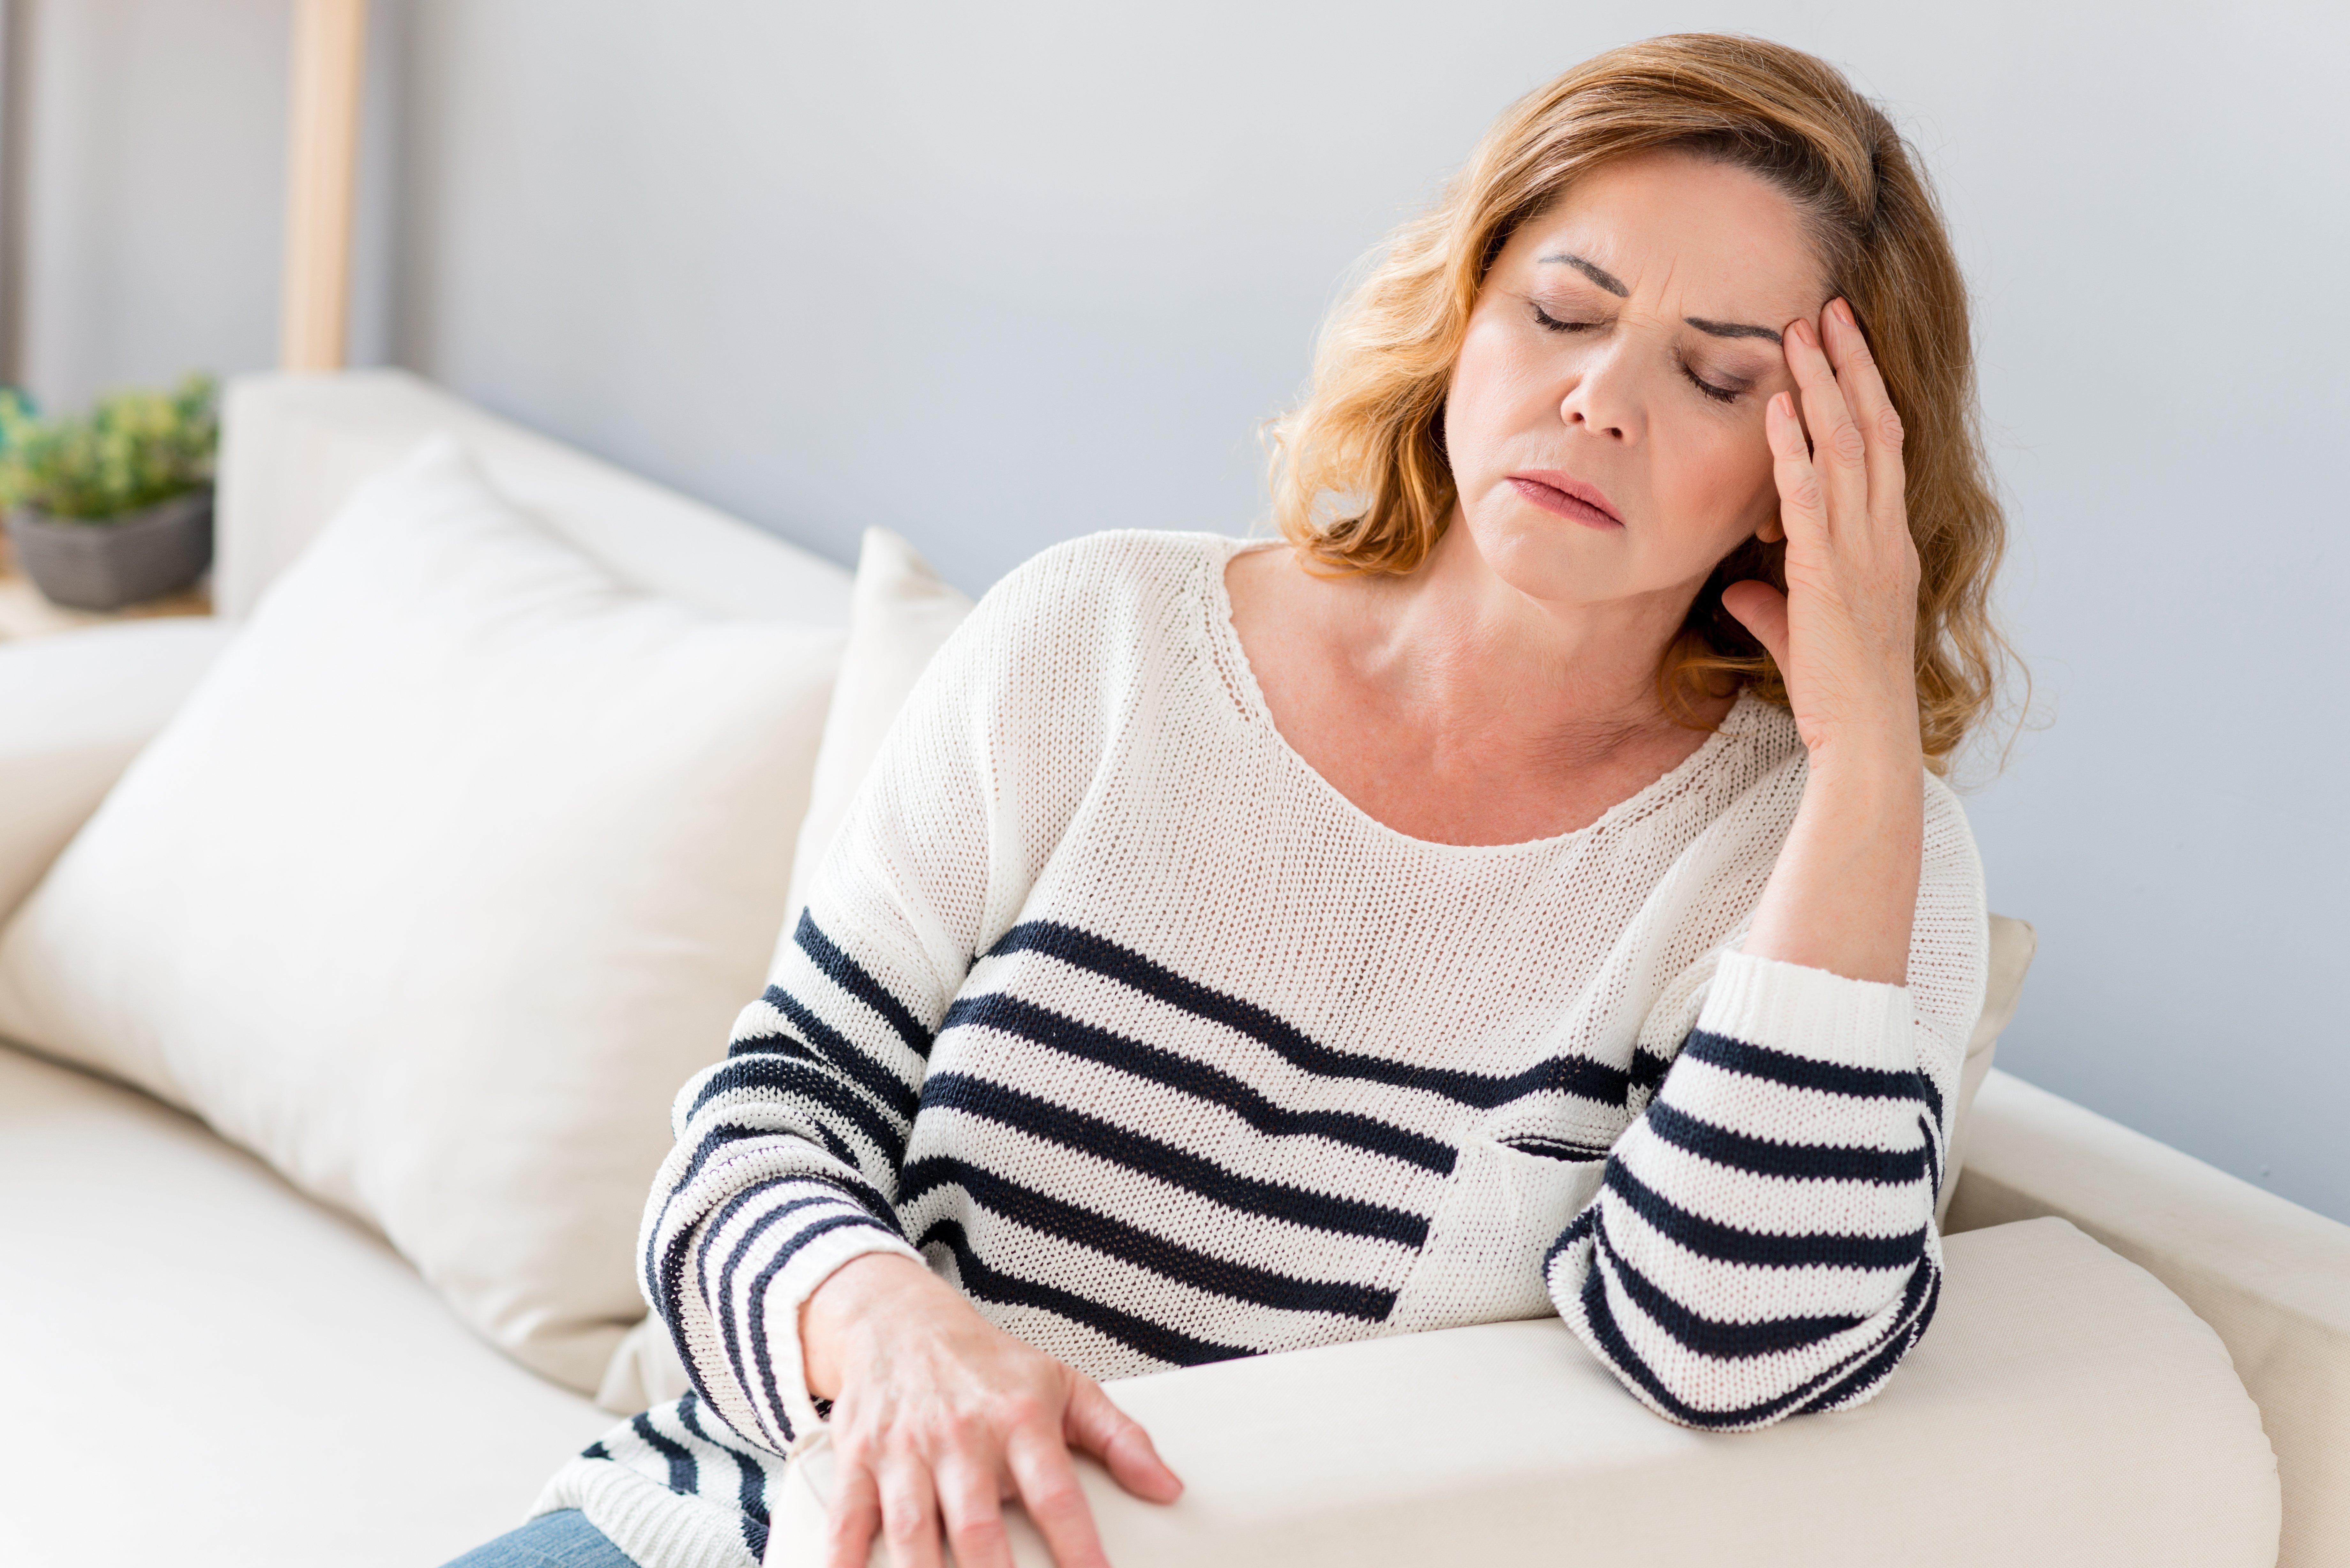 Quiz: Are You Experiencing Caregiver Burnout?